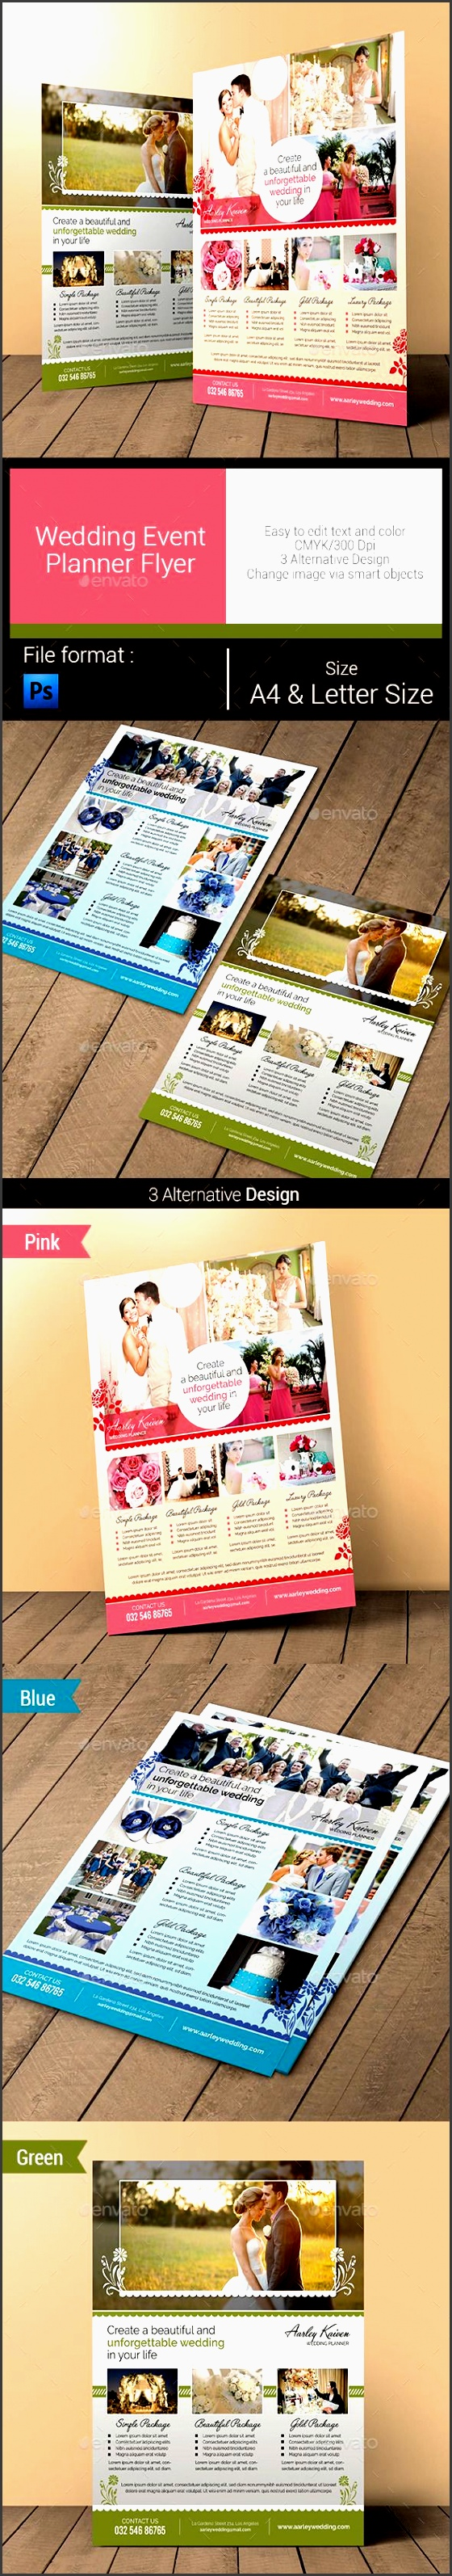 wedding event planner flyer corporate flyers